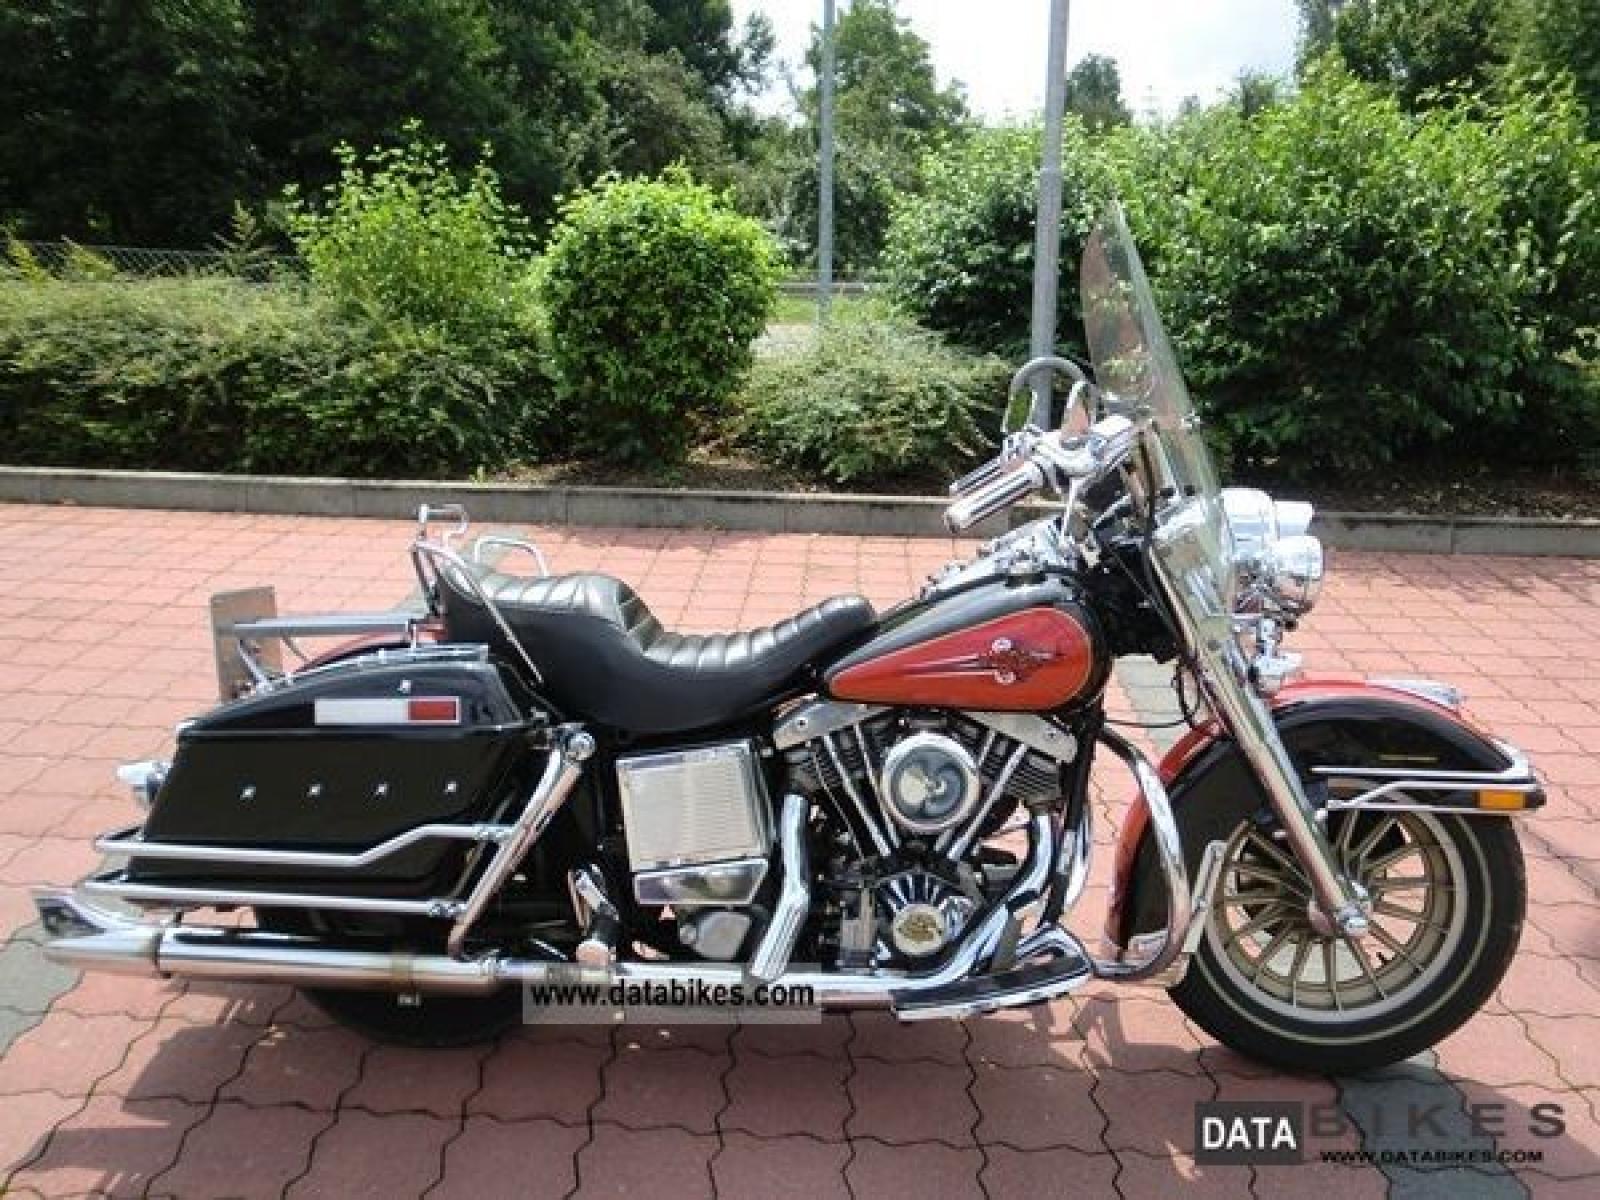 hight resolution of 1990 harley davidson flhs 1340 electra glide sport moto zombdrive com rh moto zombdrive com 1988 flhs electra glide sport 1992 electra glide sport